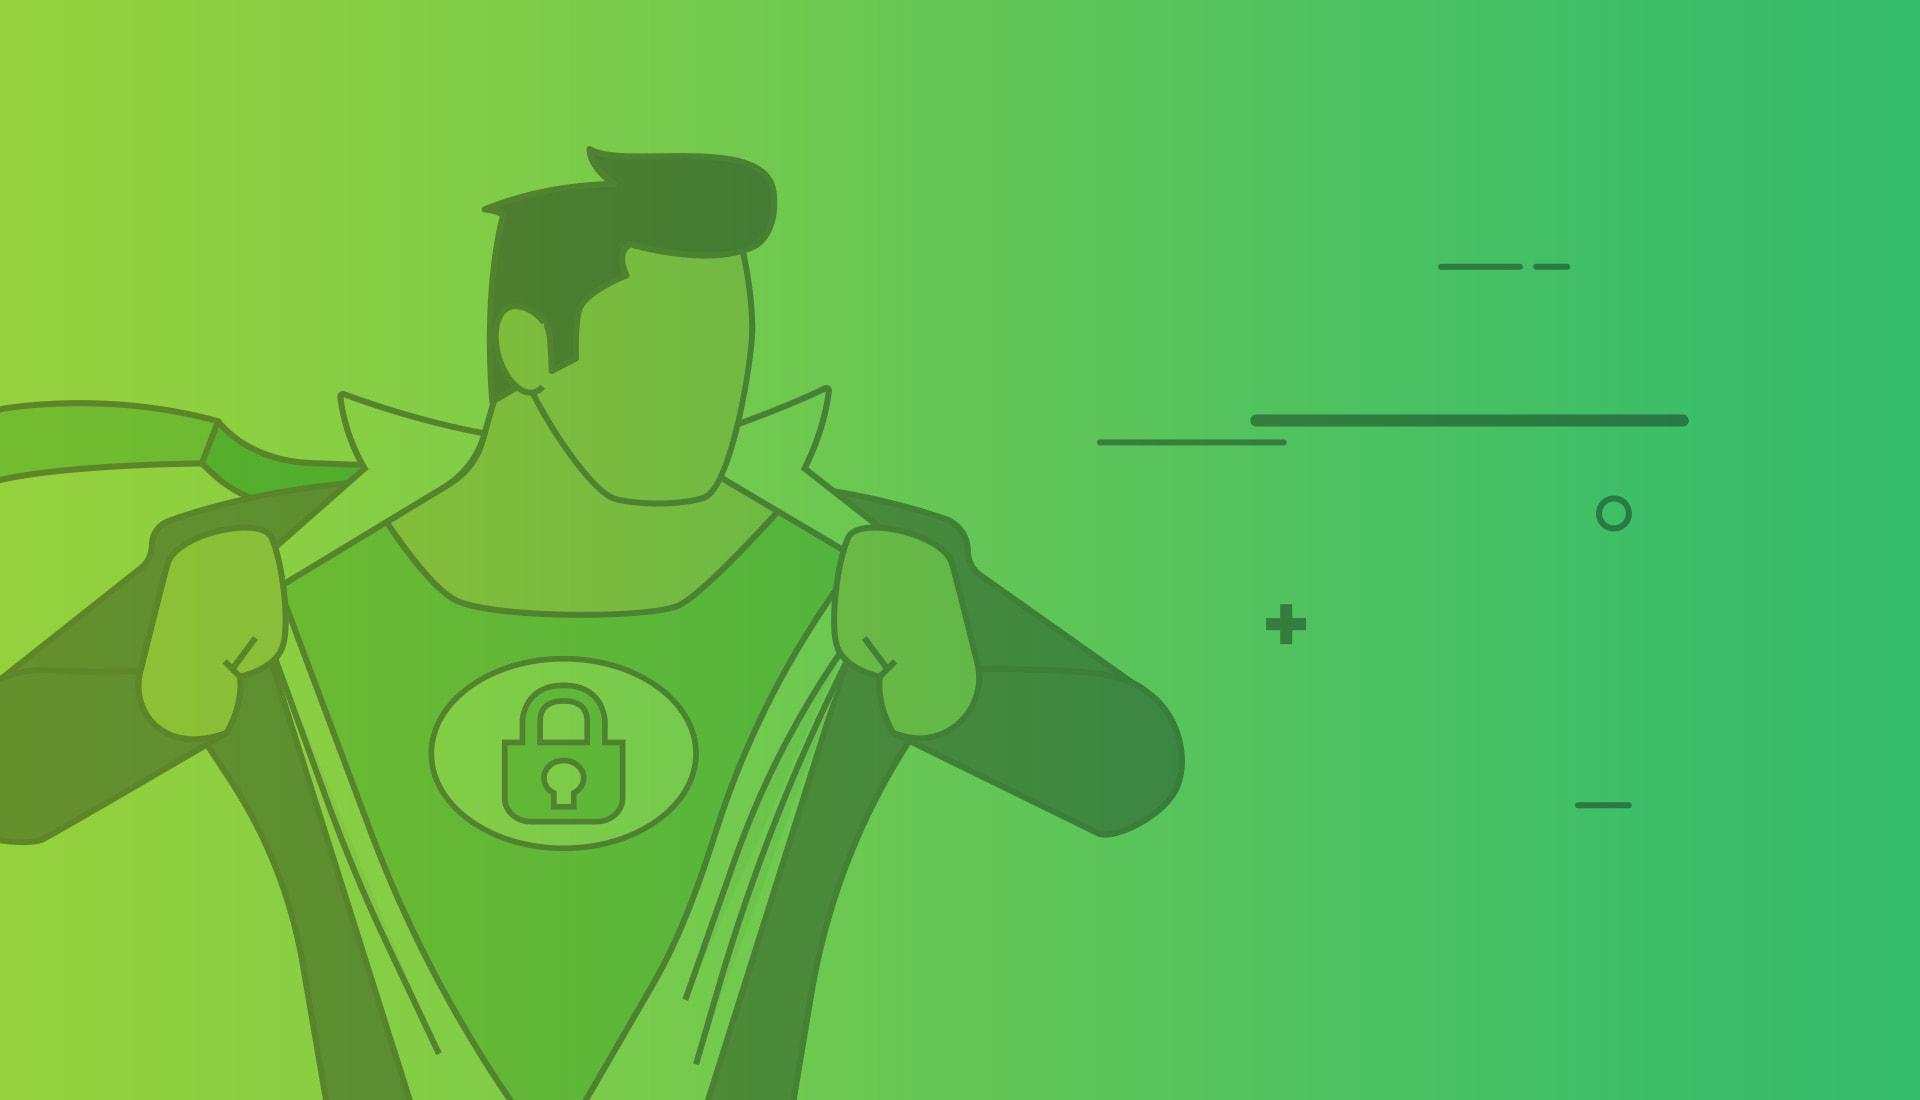 https security man illustration